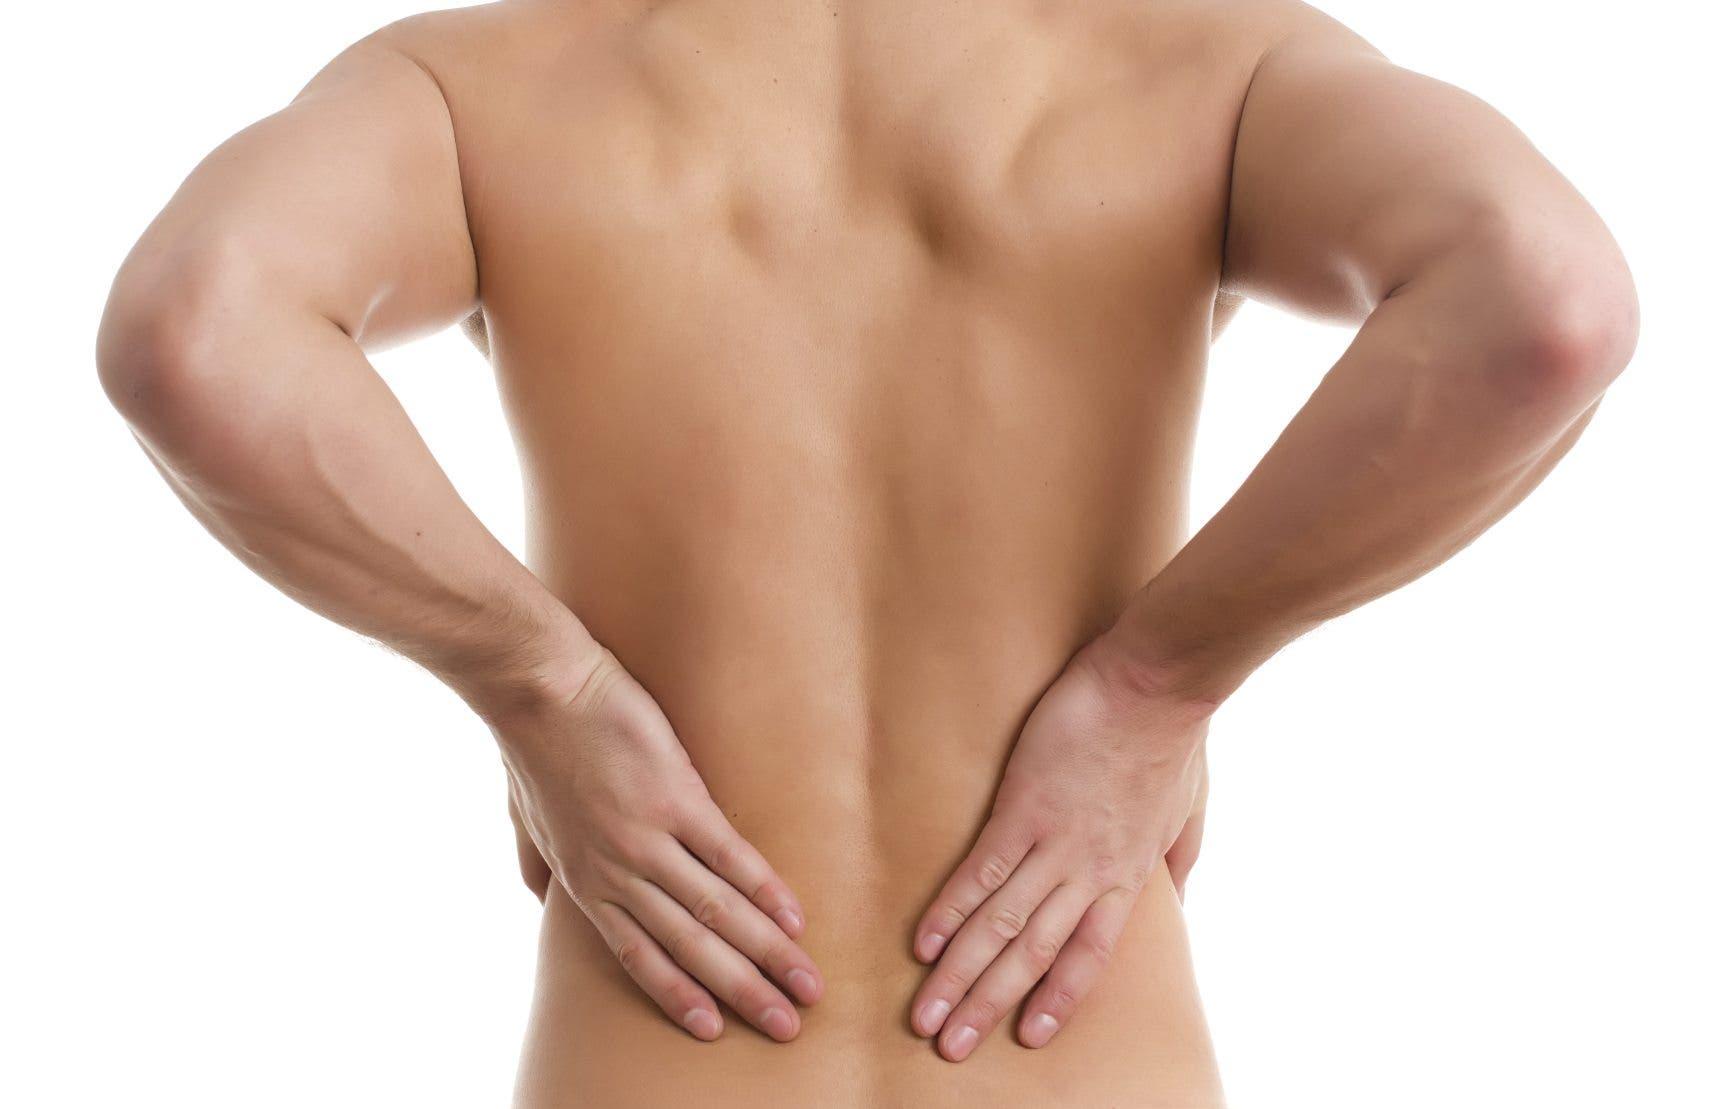 La falta del aire a la osteocondrosis del departamento de pecho